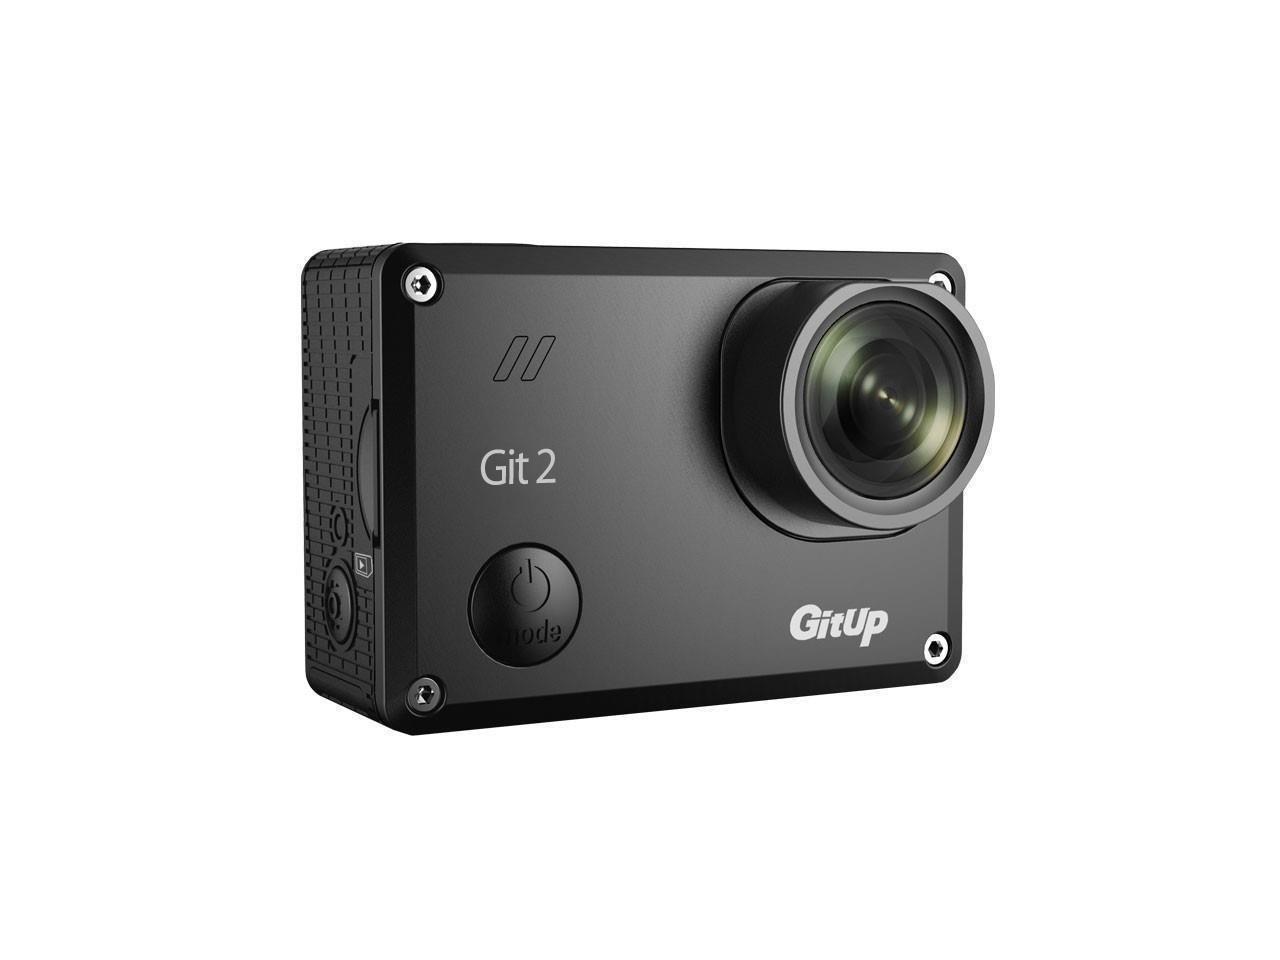 SILE GitUp Git2 2 K 30fps Novatek 96660 1080P 60fps Full HD WiFi cámara al aire libre impermeable Apoyo G-Sensor (only cámara)